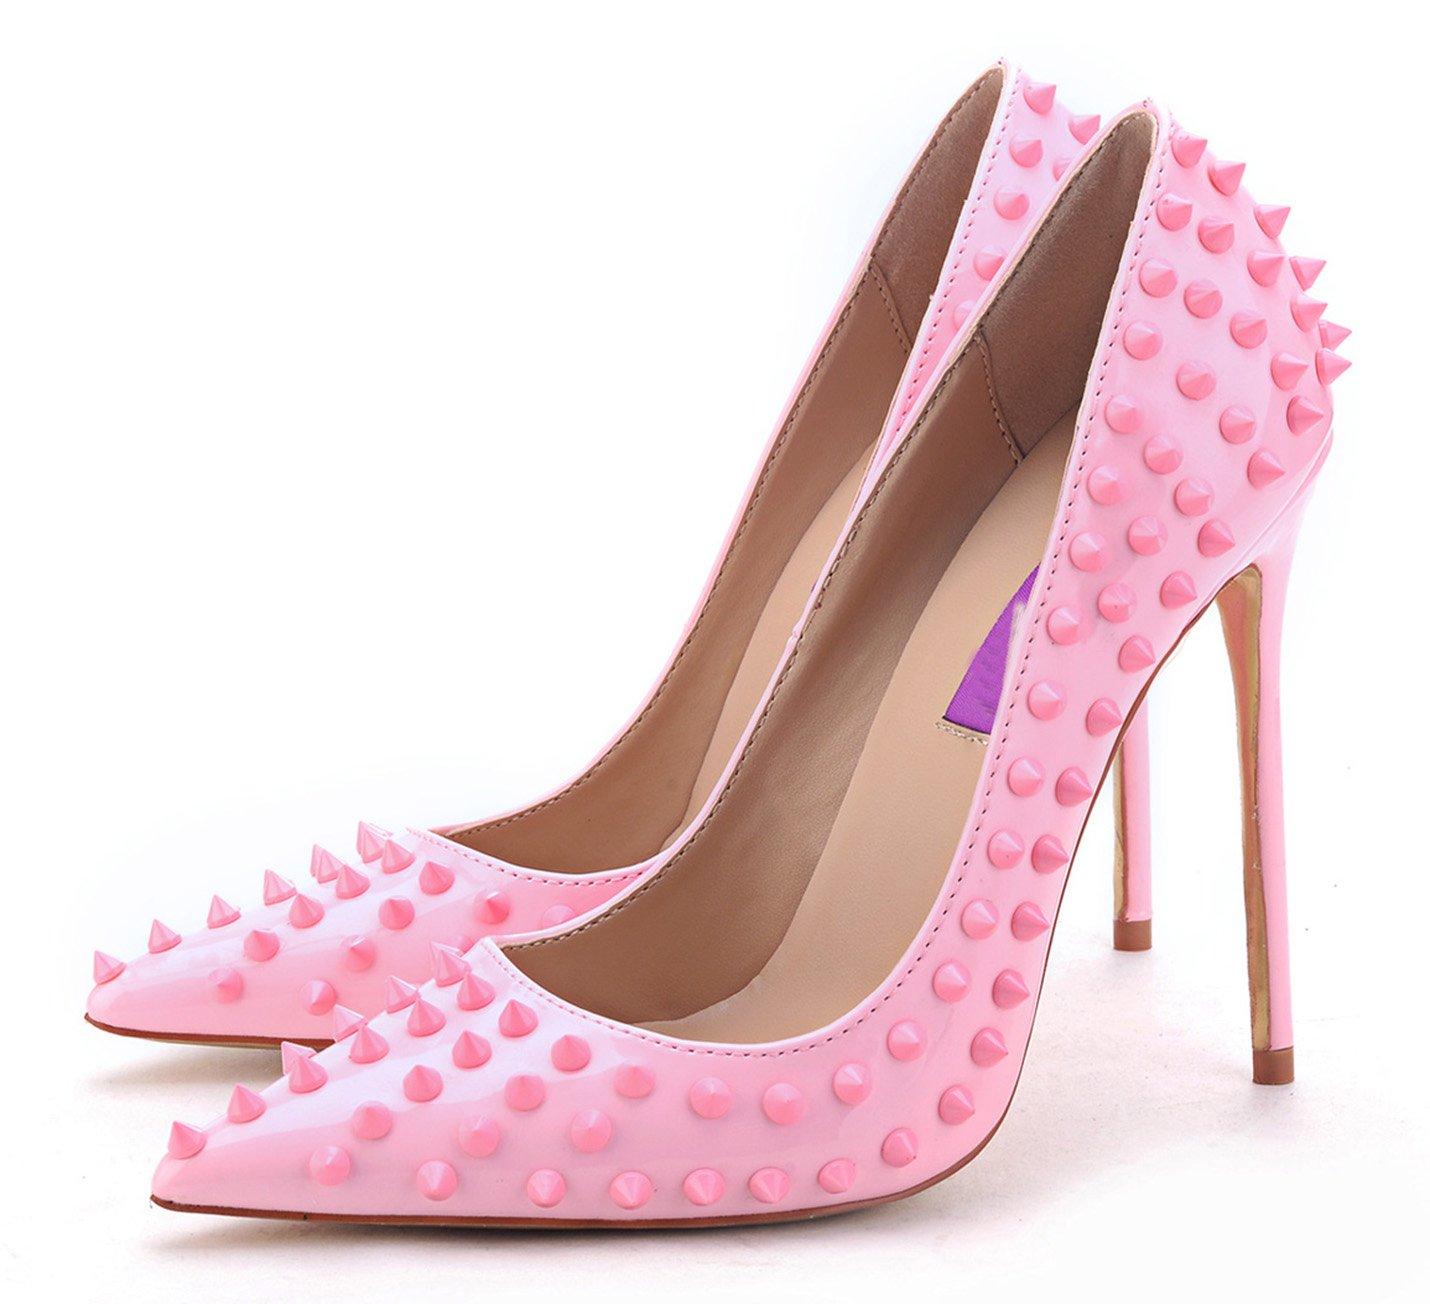 Jiu du Women's High Heel Fashion for Wedding Party Pumps Fashion Heel Rivet Studded Stiletto Pointed Toe Dress Shoes B07917B2XF US8/CN40/Foot long 25cm|Pink Pu 0cd970